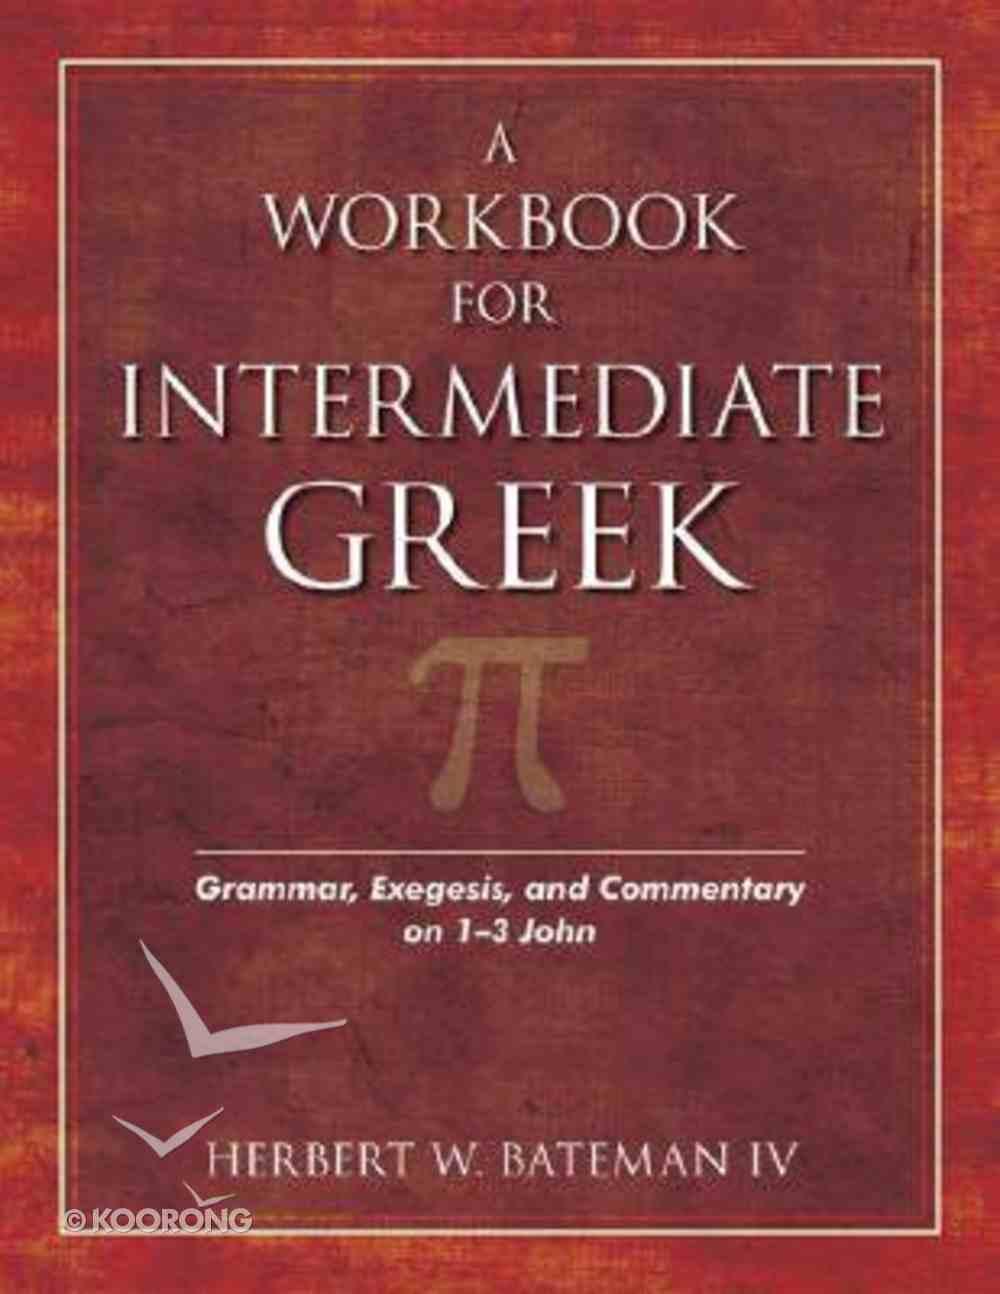 A Workbook For Intermediate Greek Paperback